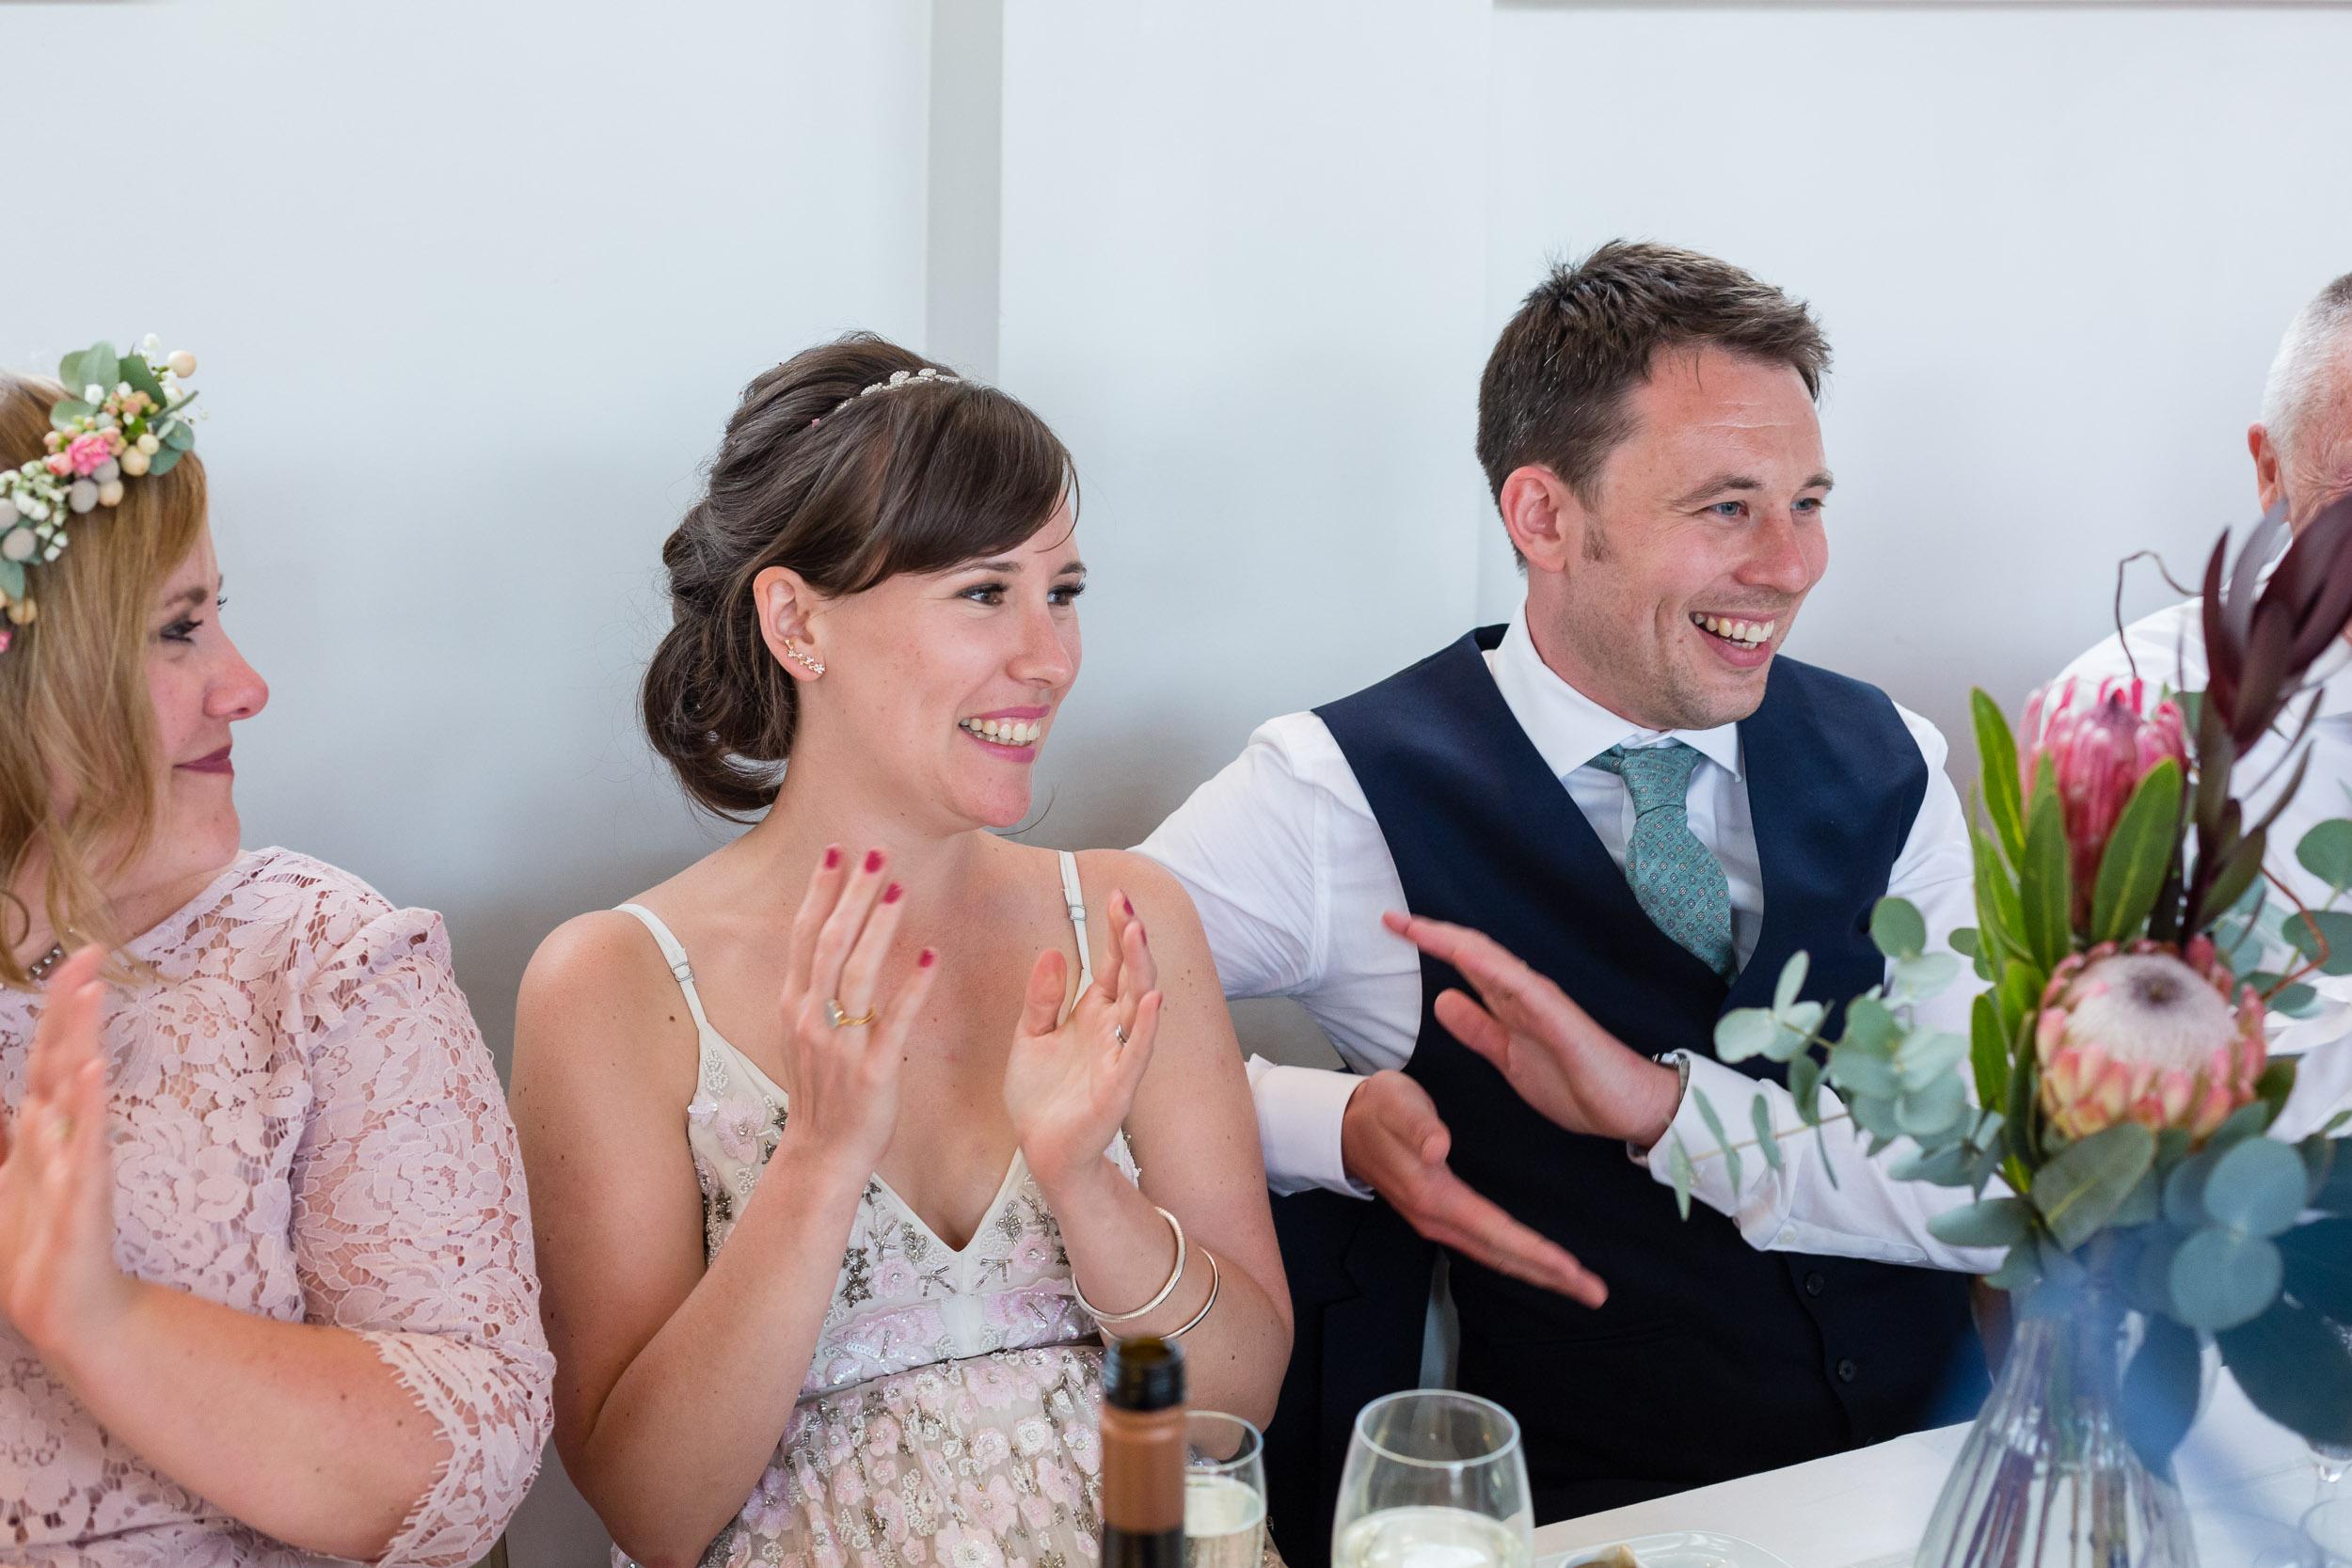 brockwell-lido-brixton-herne-hill-wedding-324.jpg